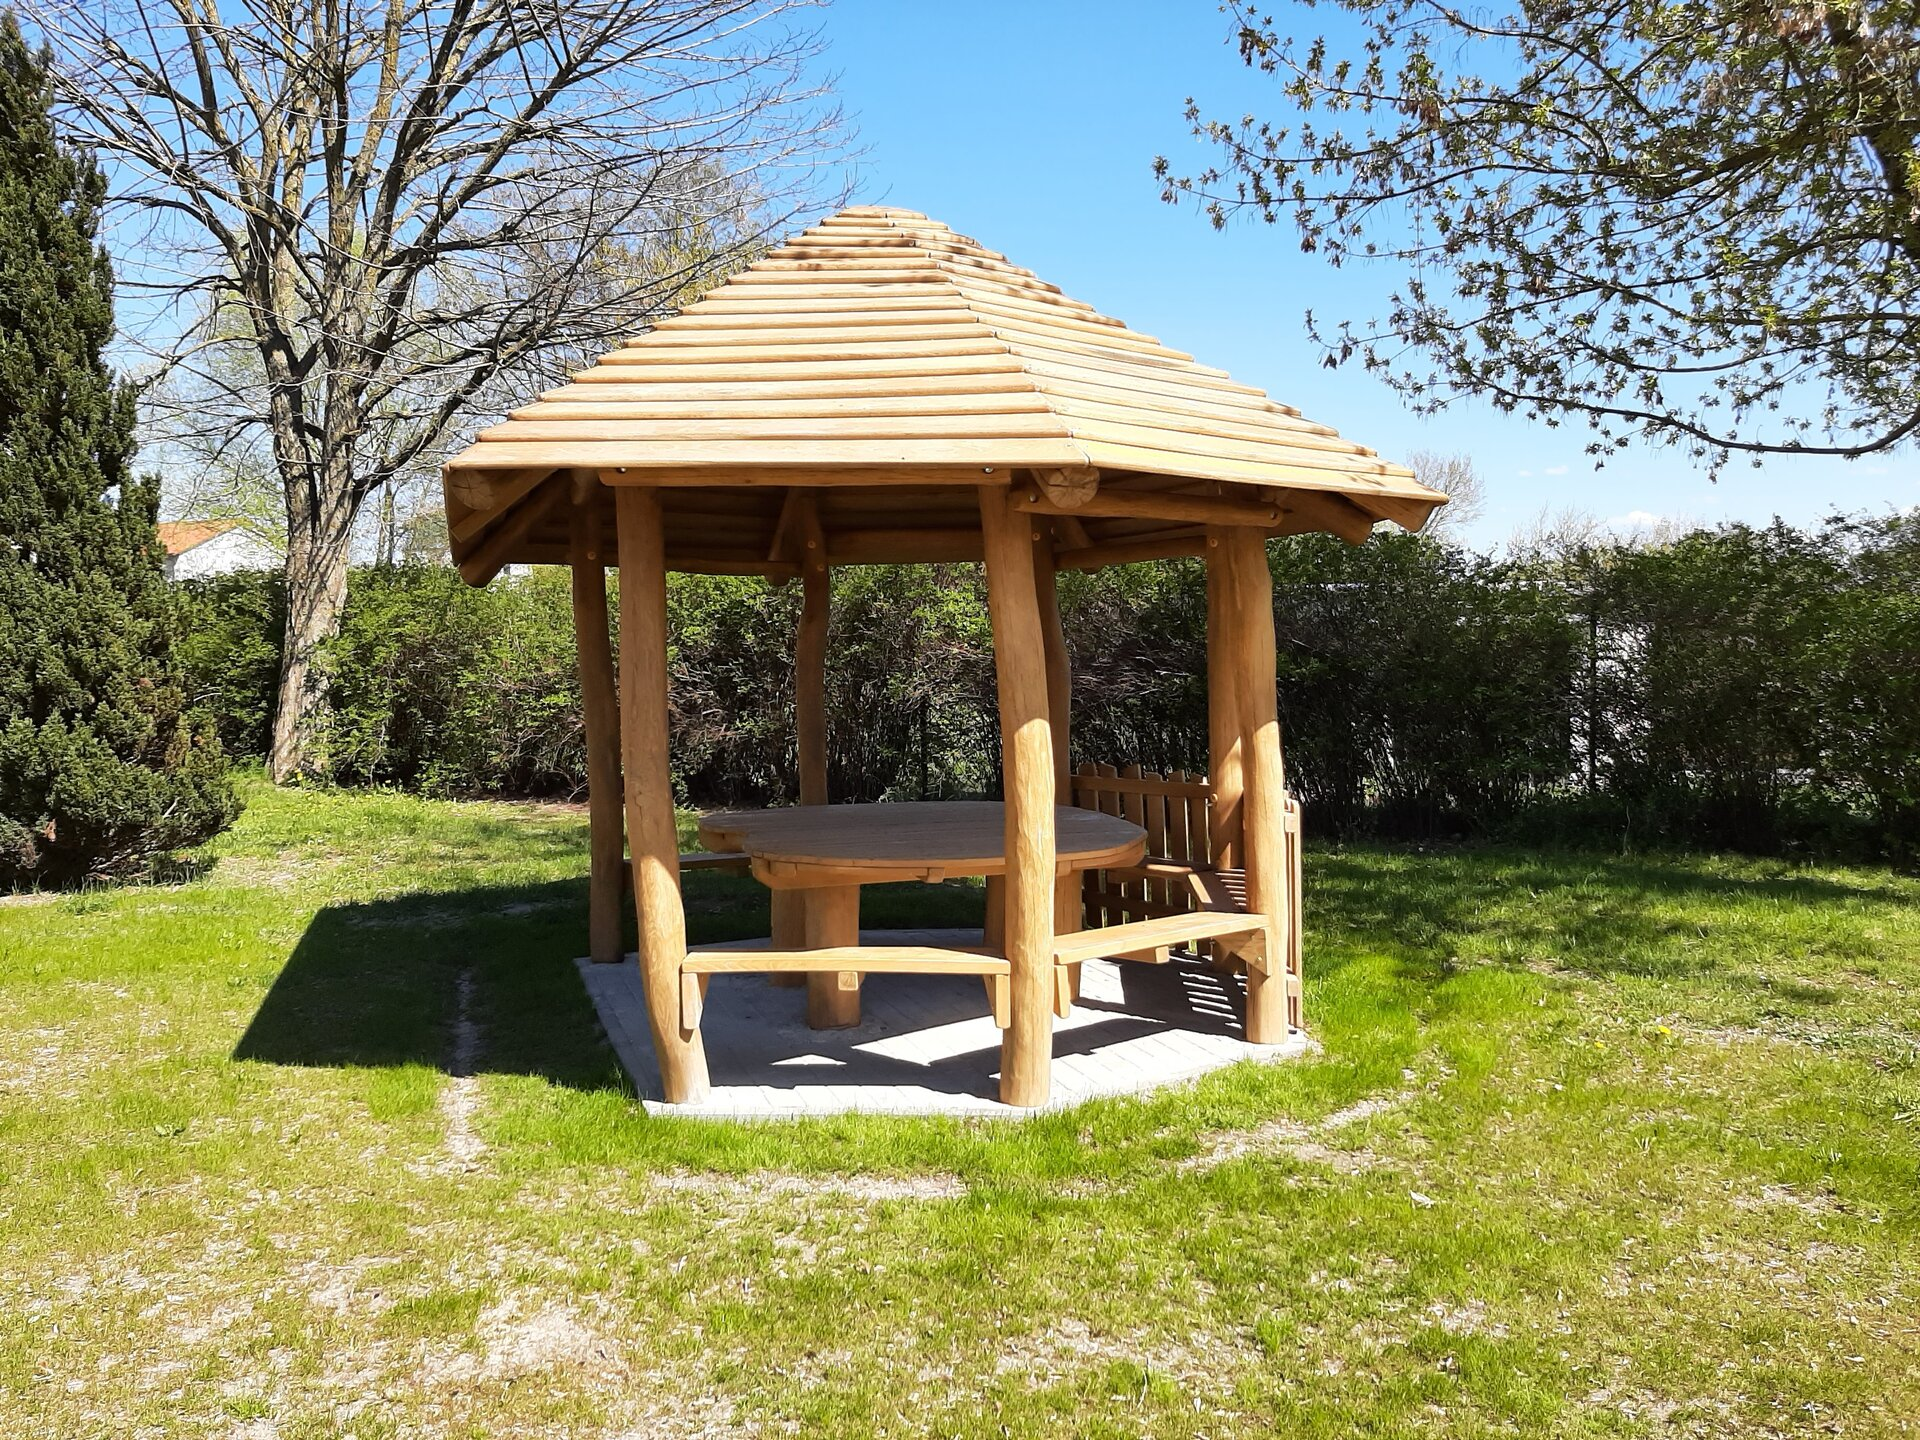 Holzpavillon in der Kita Rappelkiste